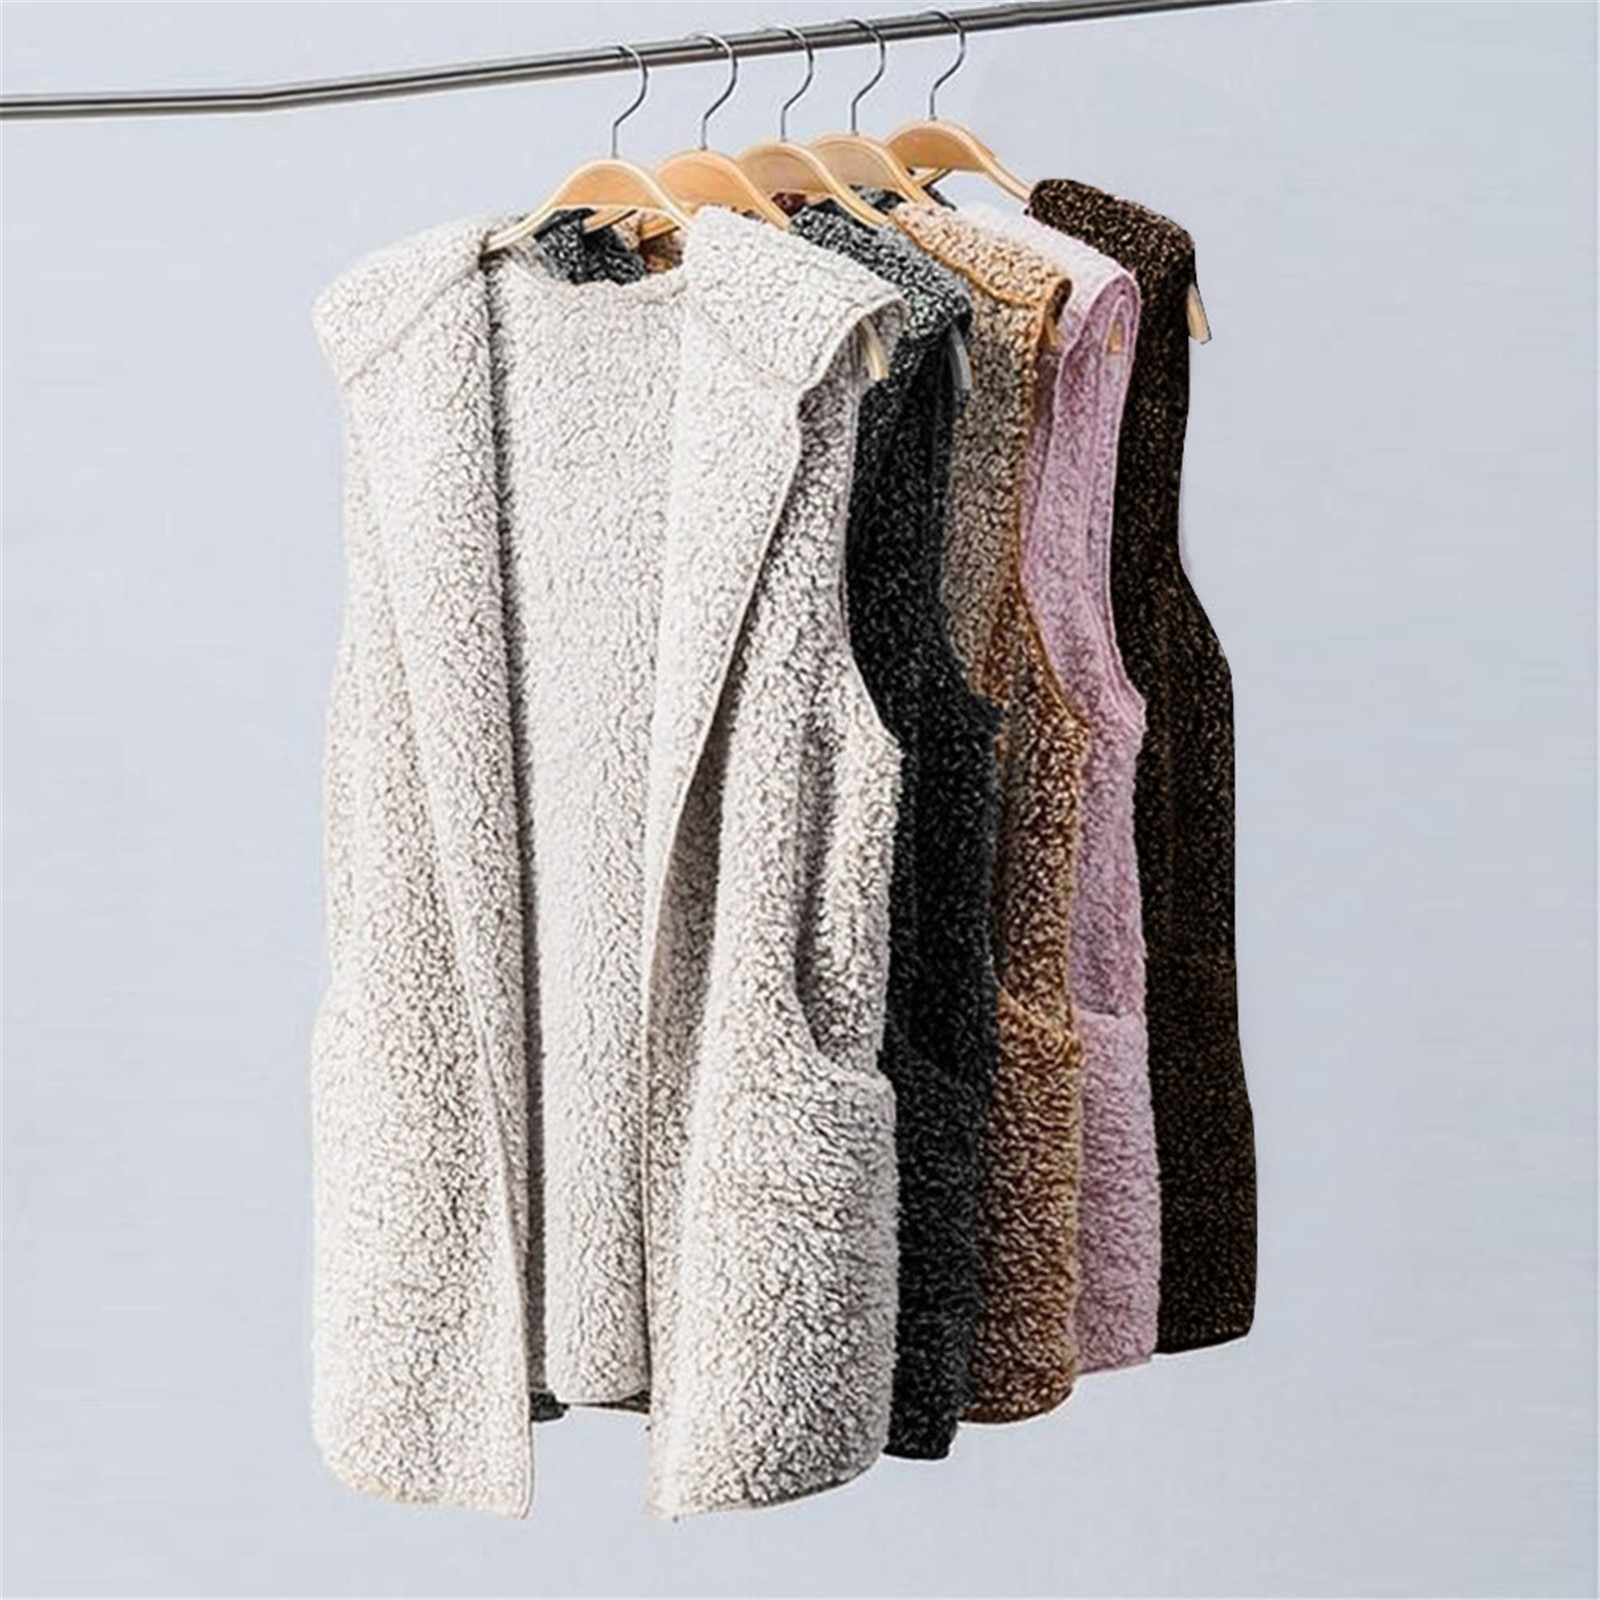 Sudadera con capucha para Mujer, prendas de vestir, Abrigo informal, chaqueta para...